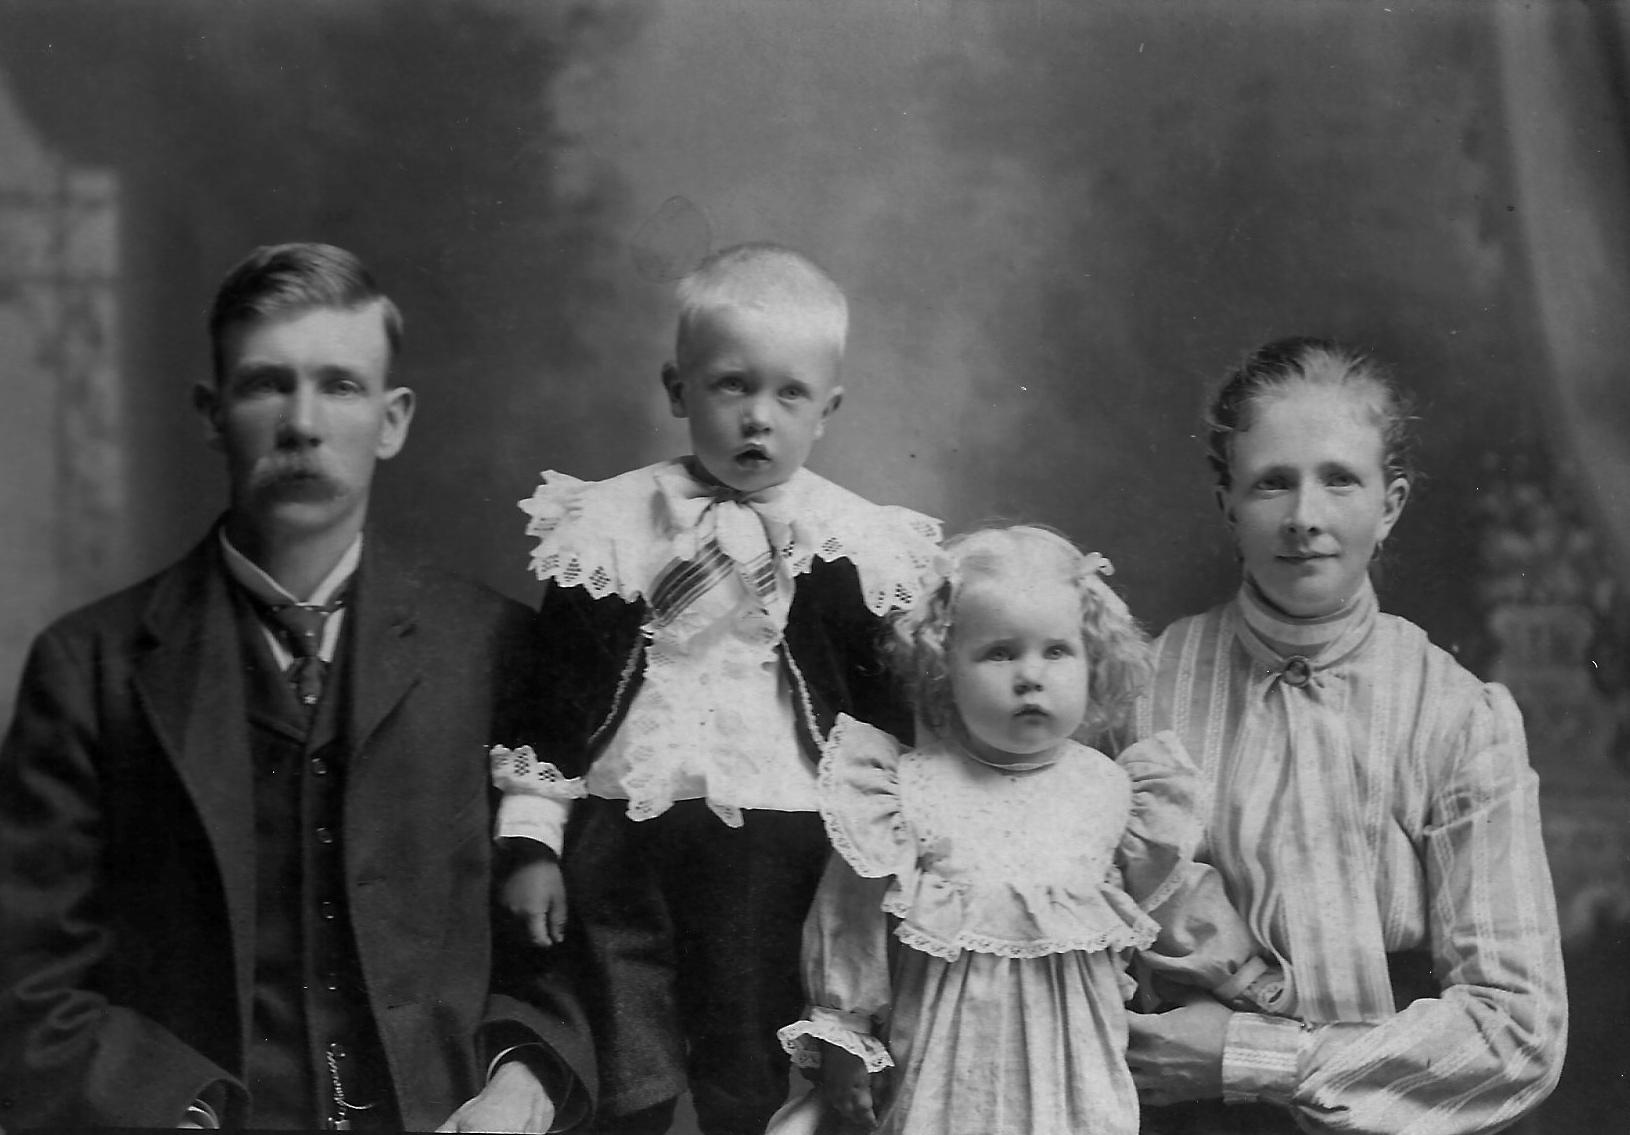 Bloomquist, Albert and Family